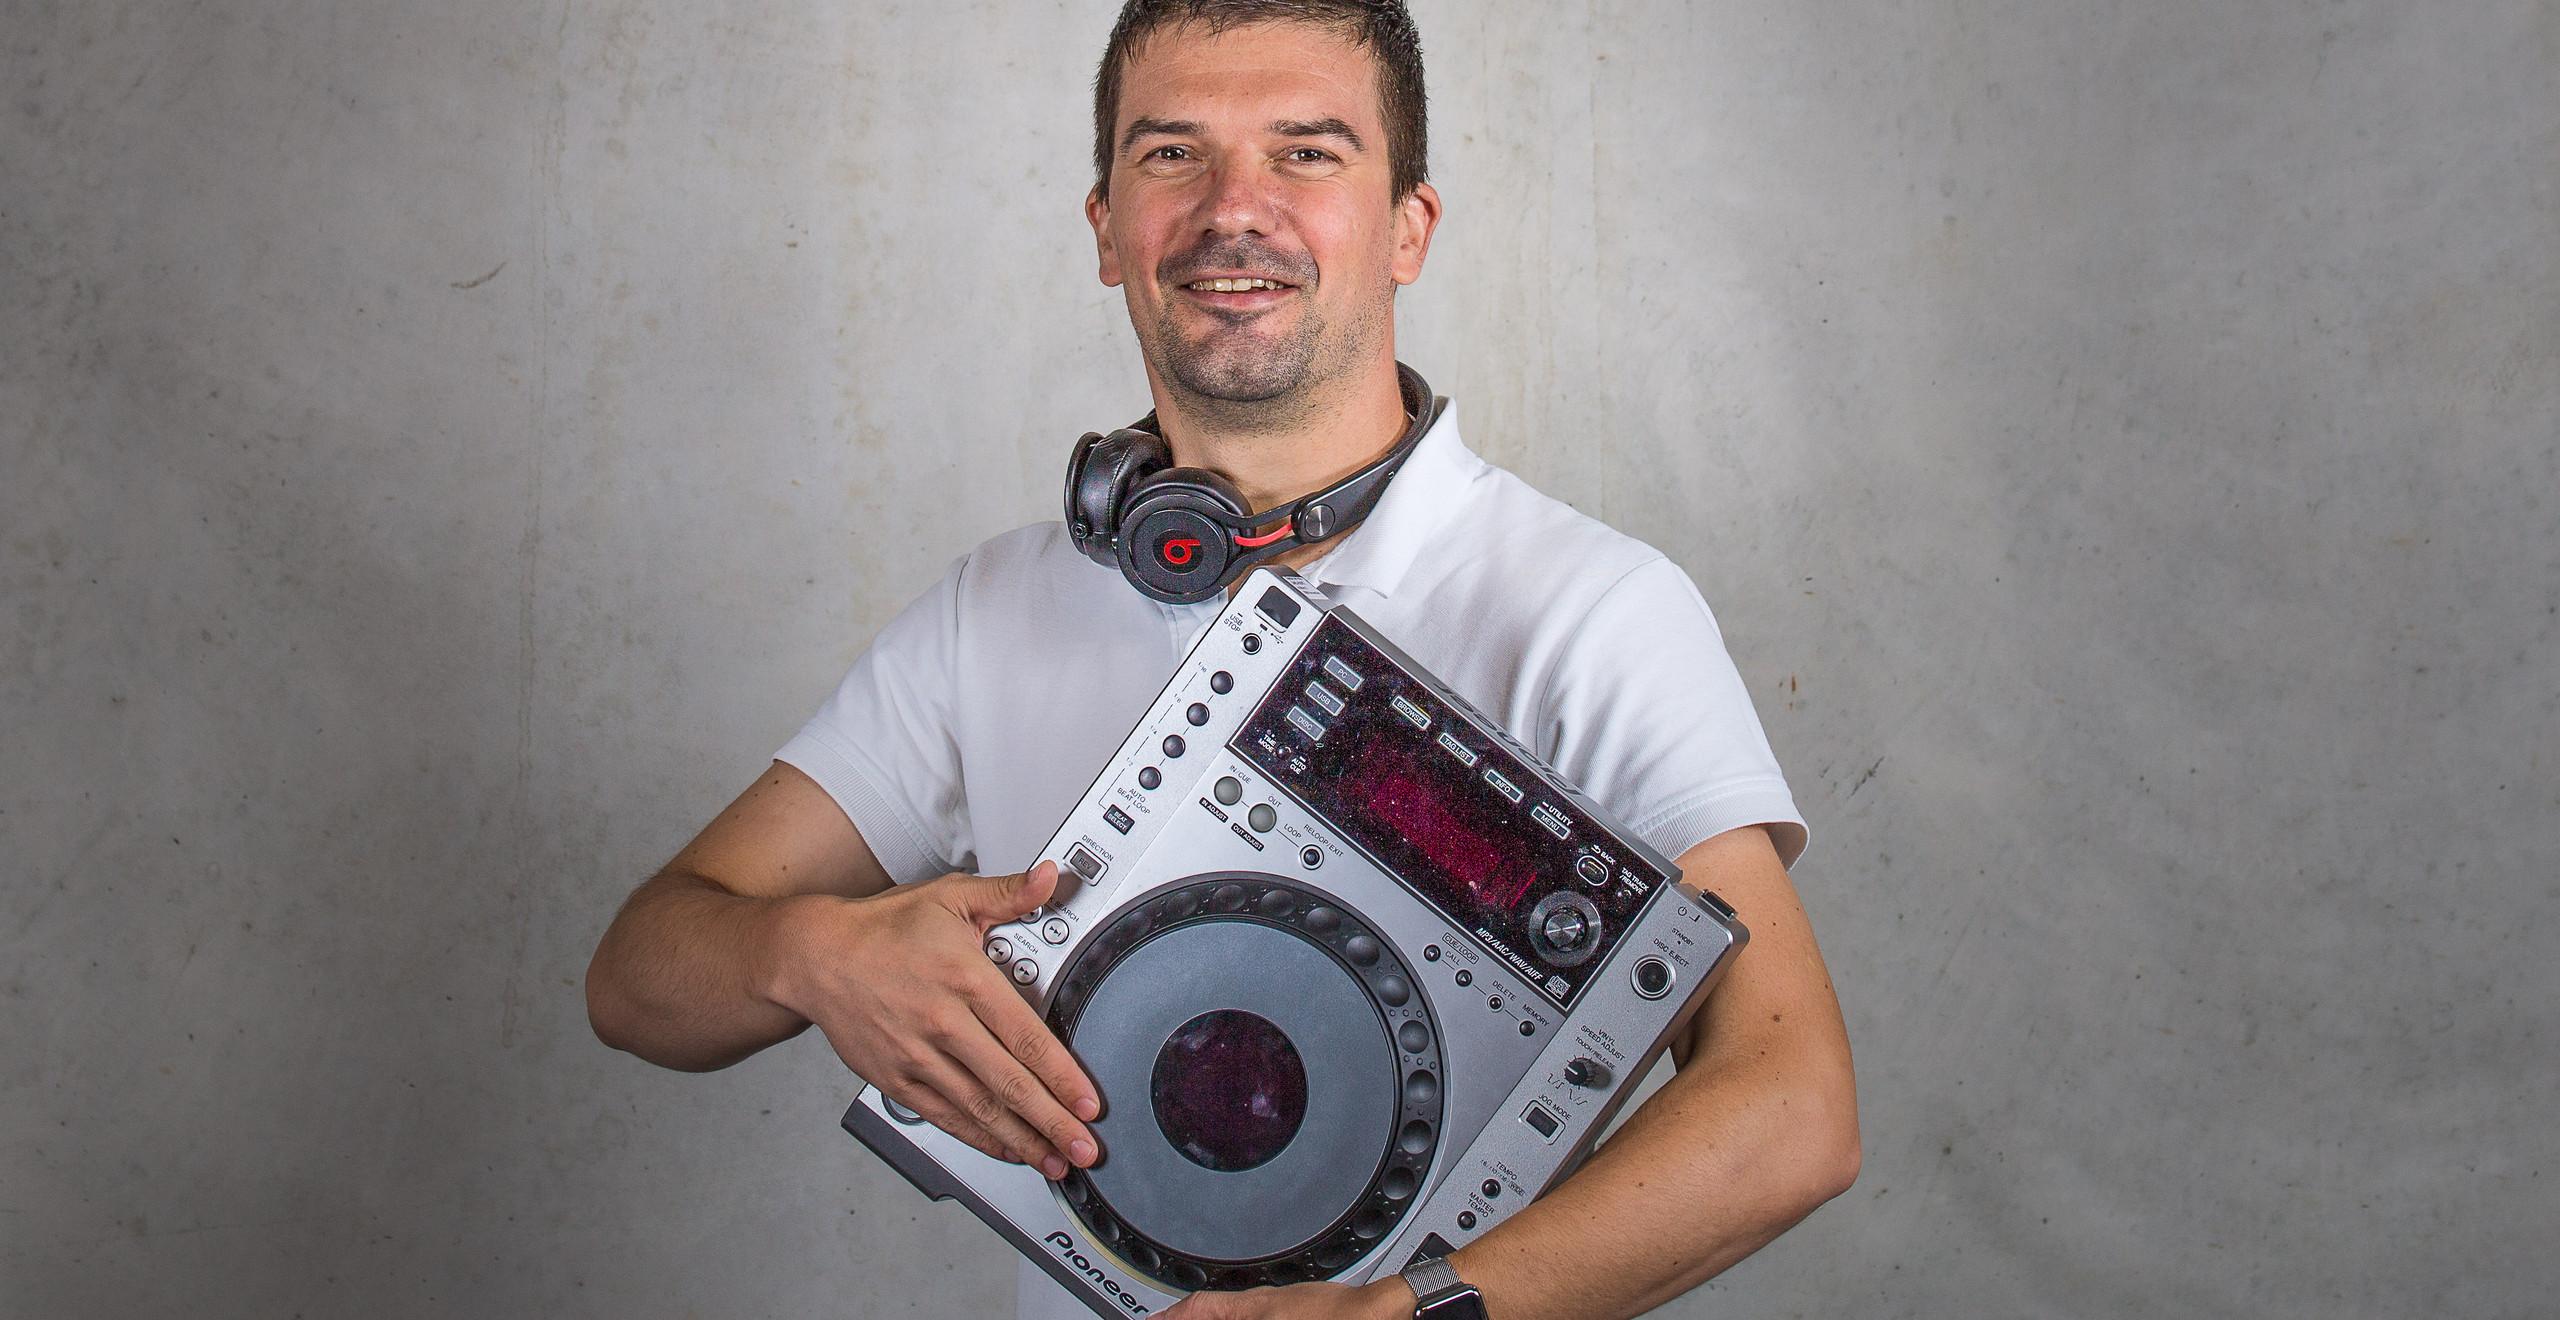 Christian Langer, DJ CL Shorty